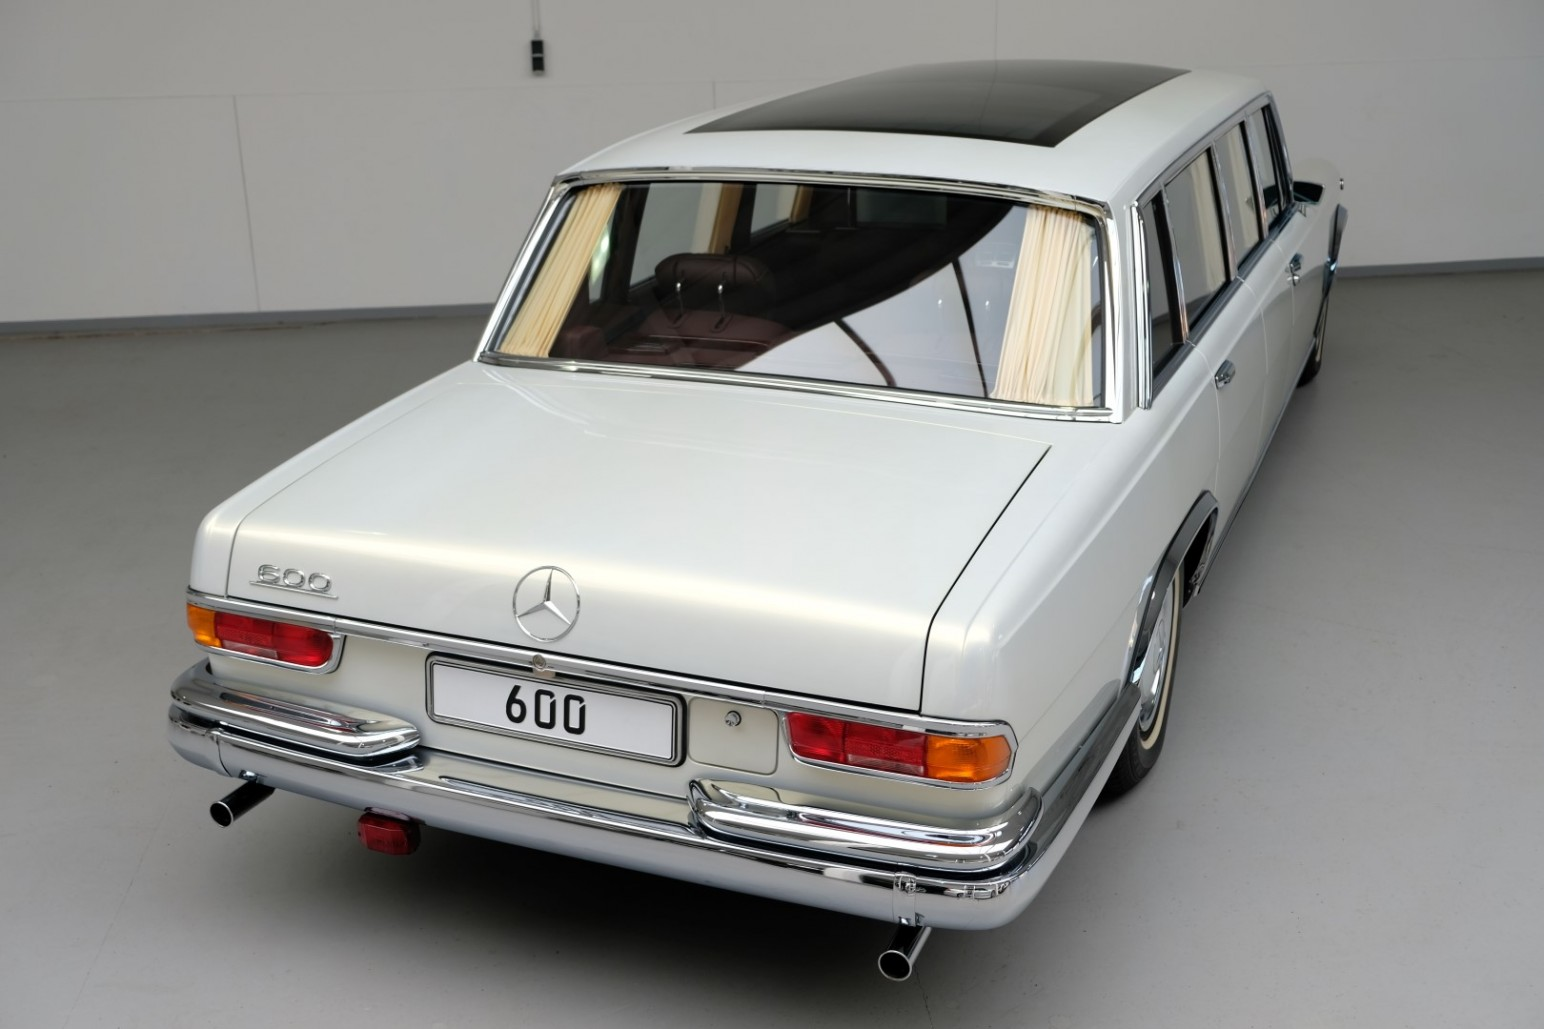 Mercedes-Benz 600 Pullman top